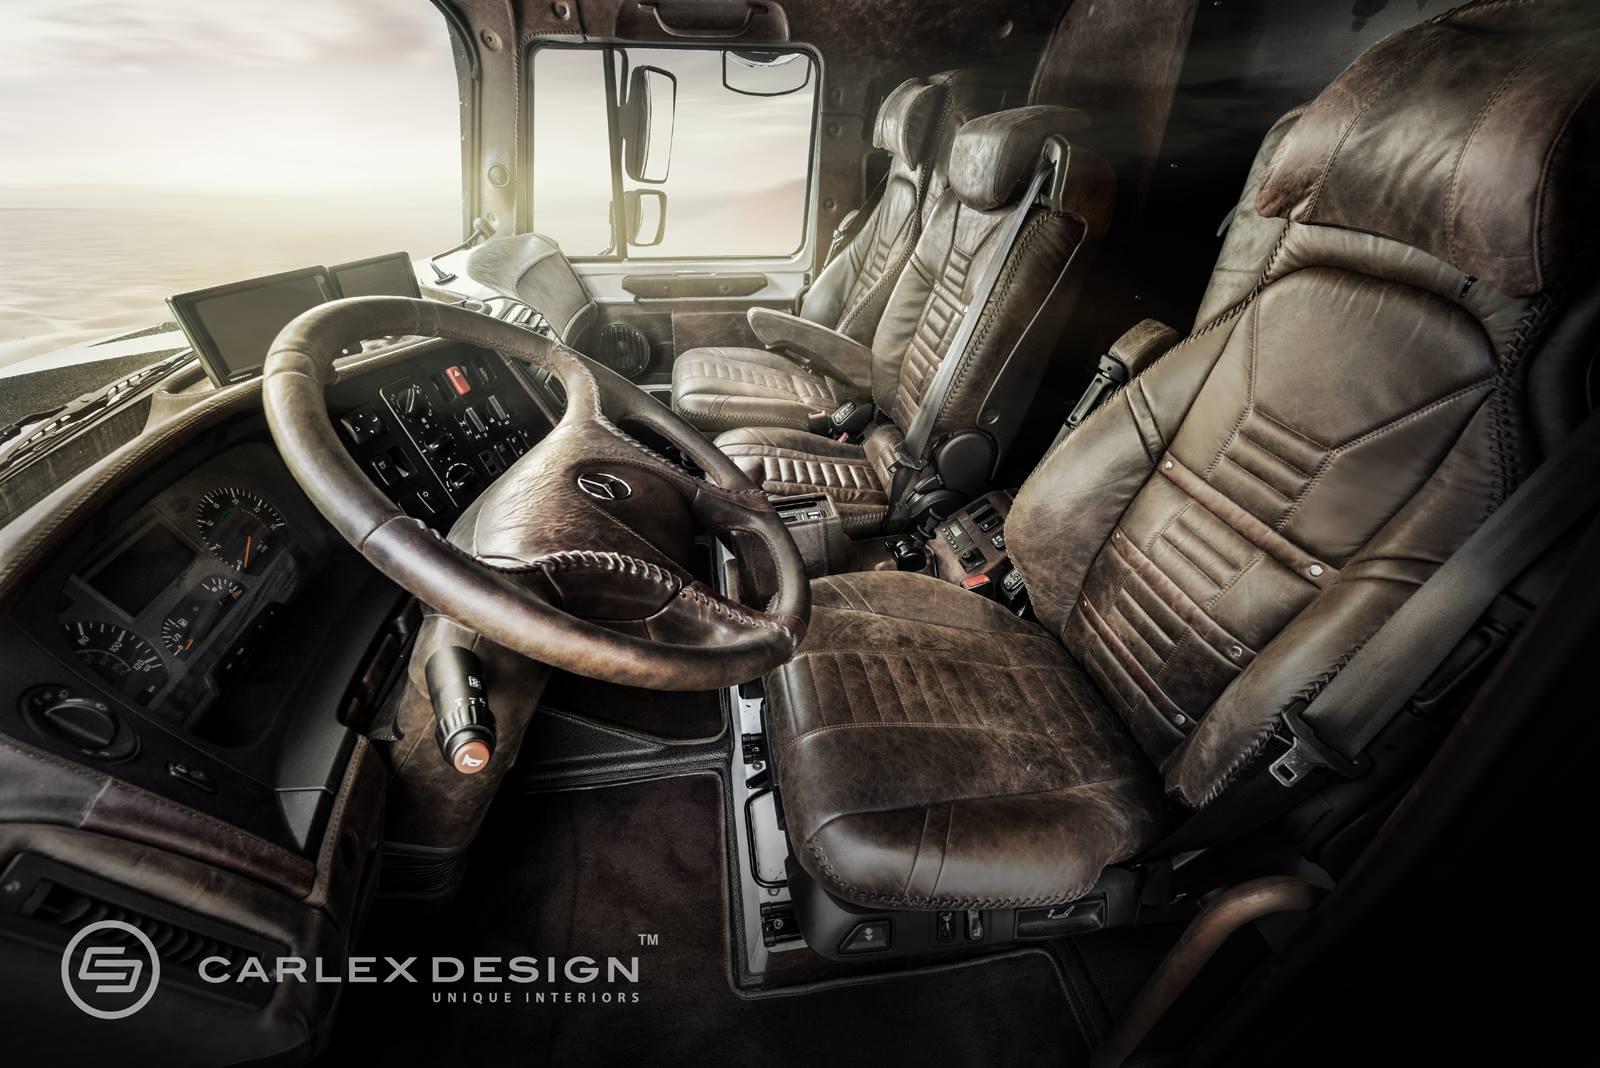 mercedes zetros gets desert themed luxury interior from carlex